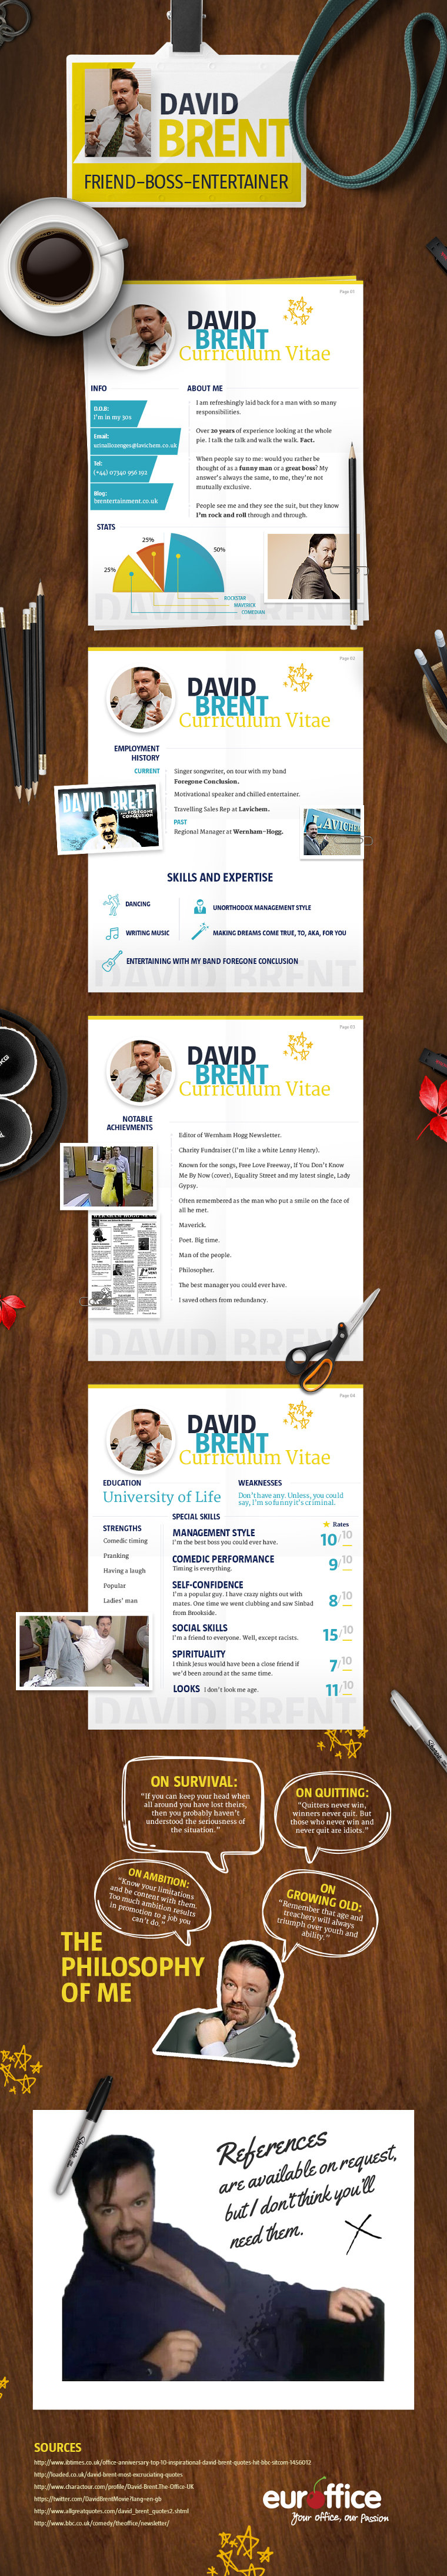 David Brent CV - infographic